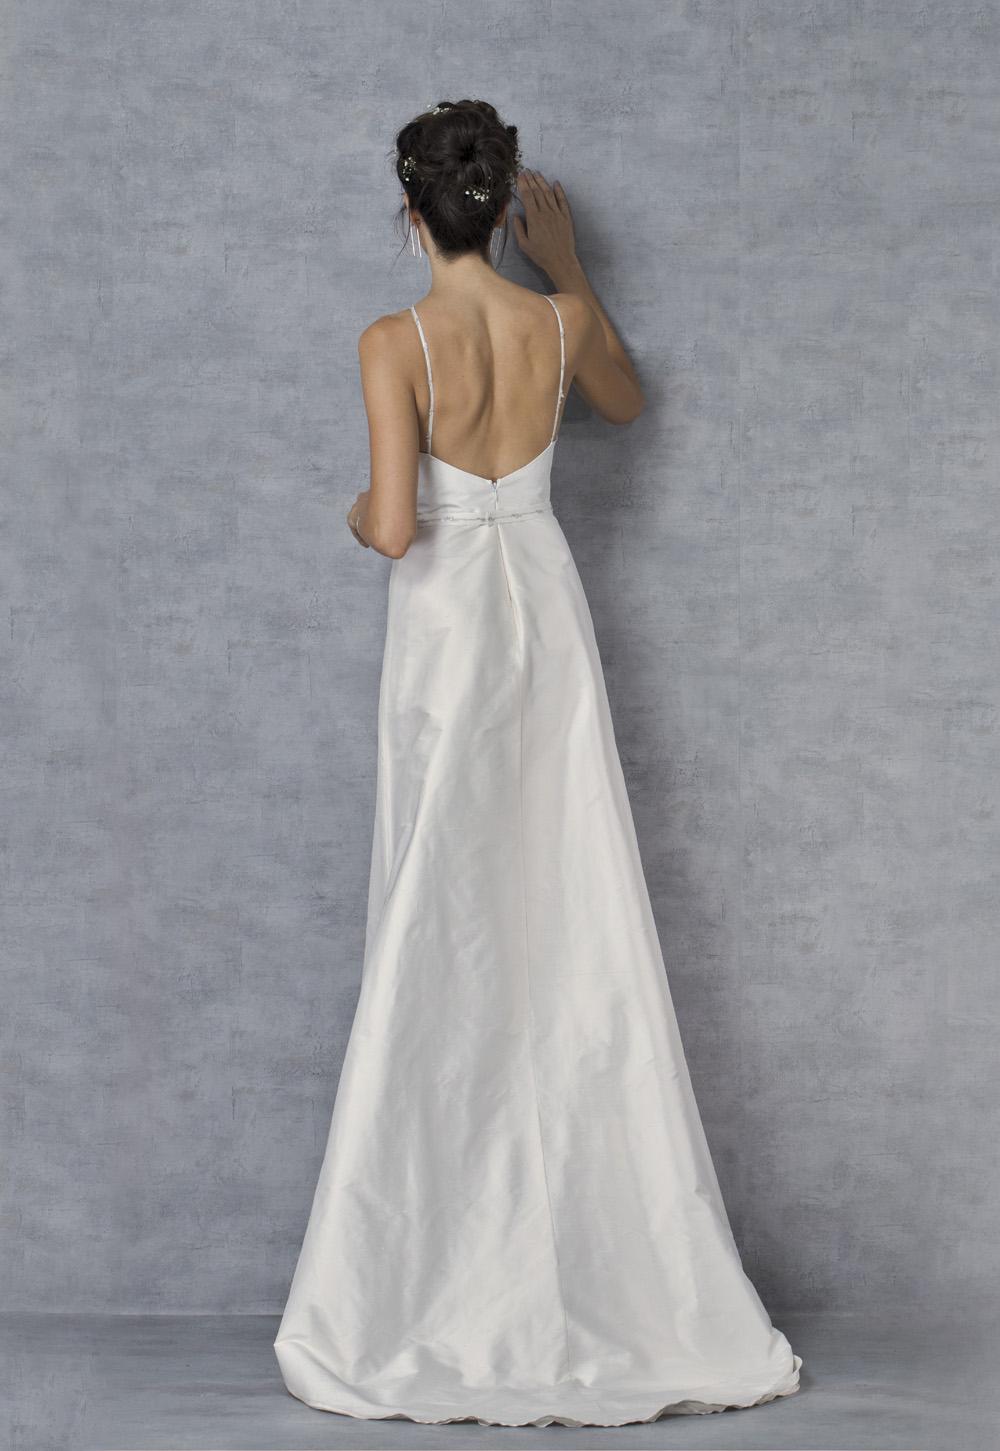 I3A9756 שמלות כלה - שמלה